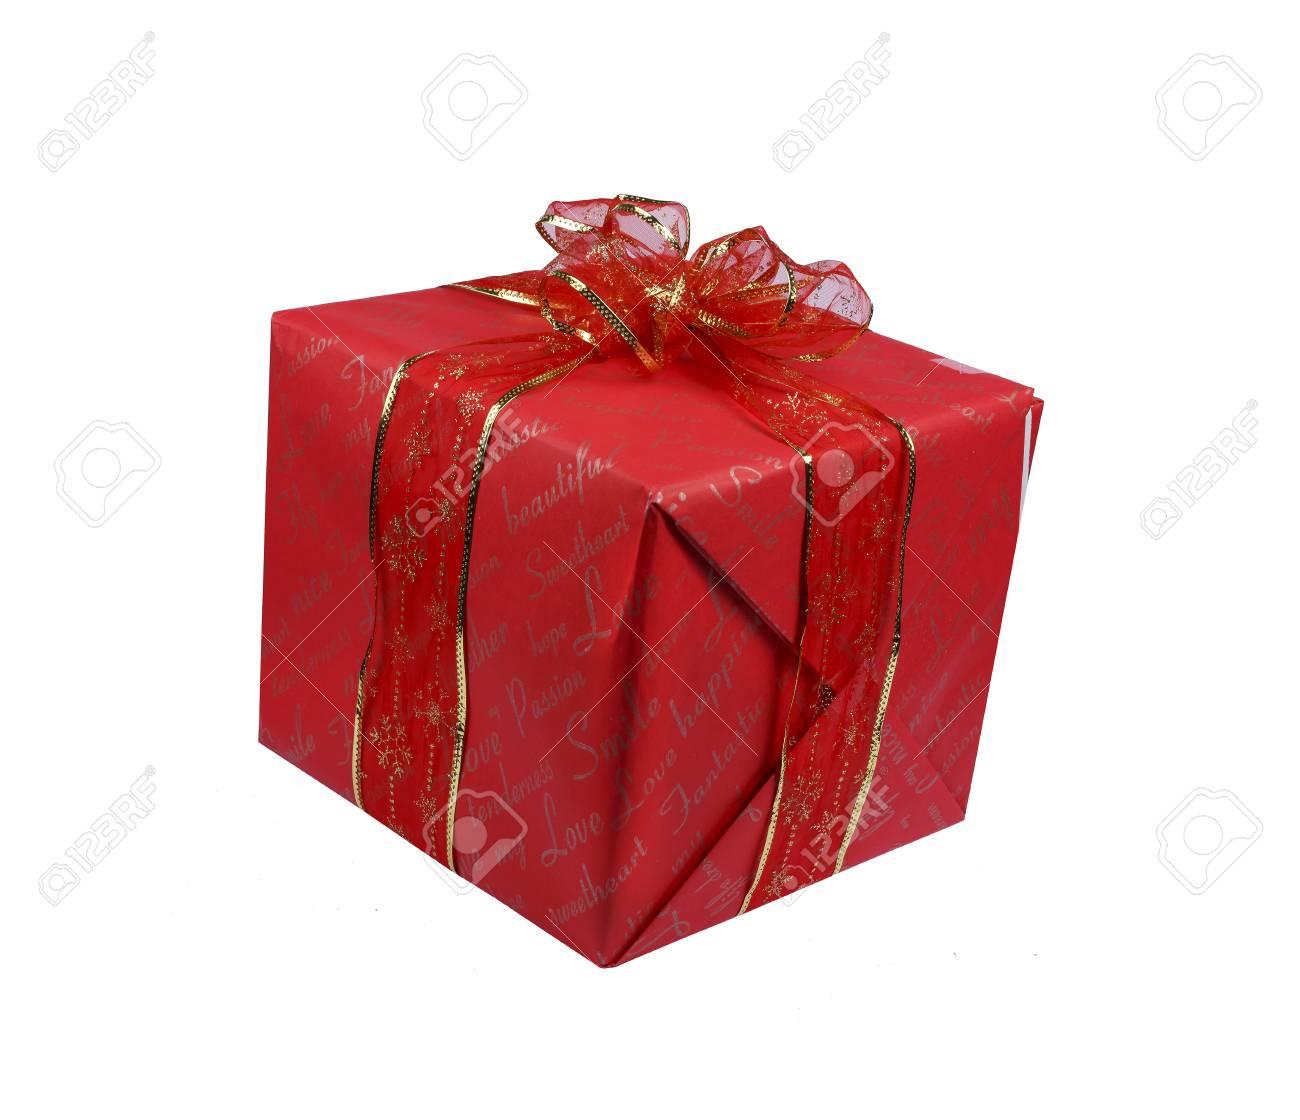 Holiday Christmas Birthday Gift Box Isolated White Background